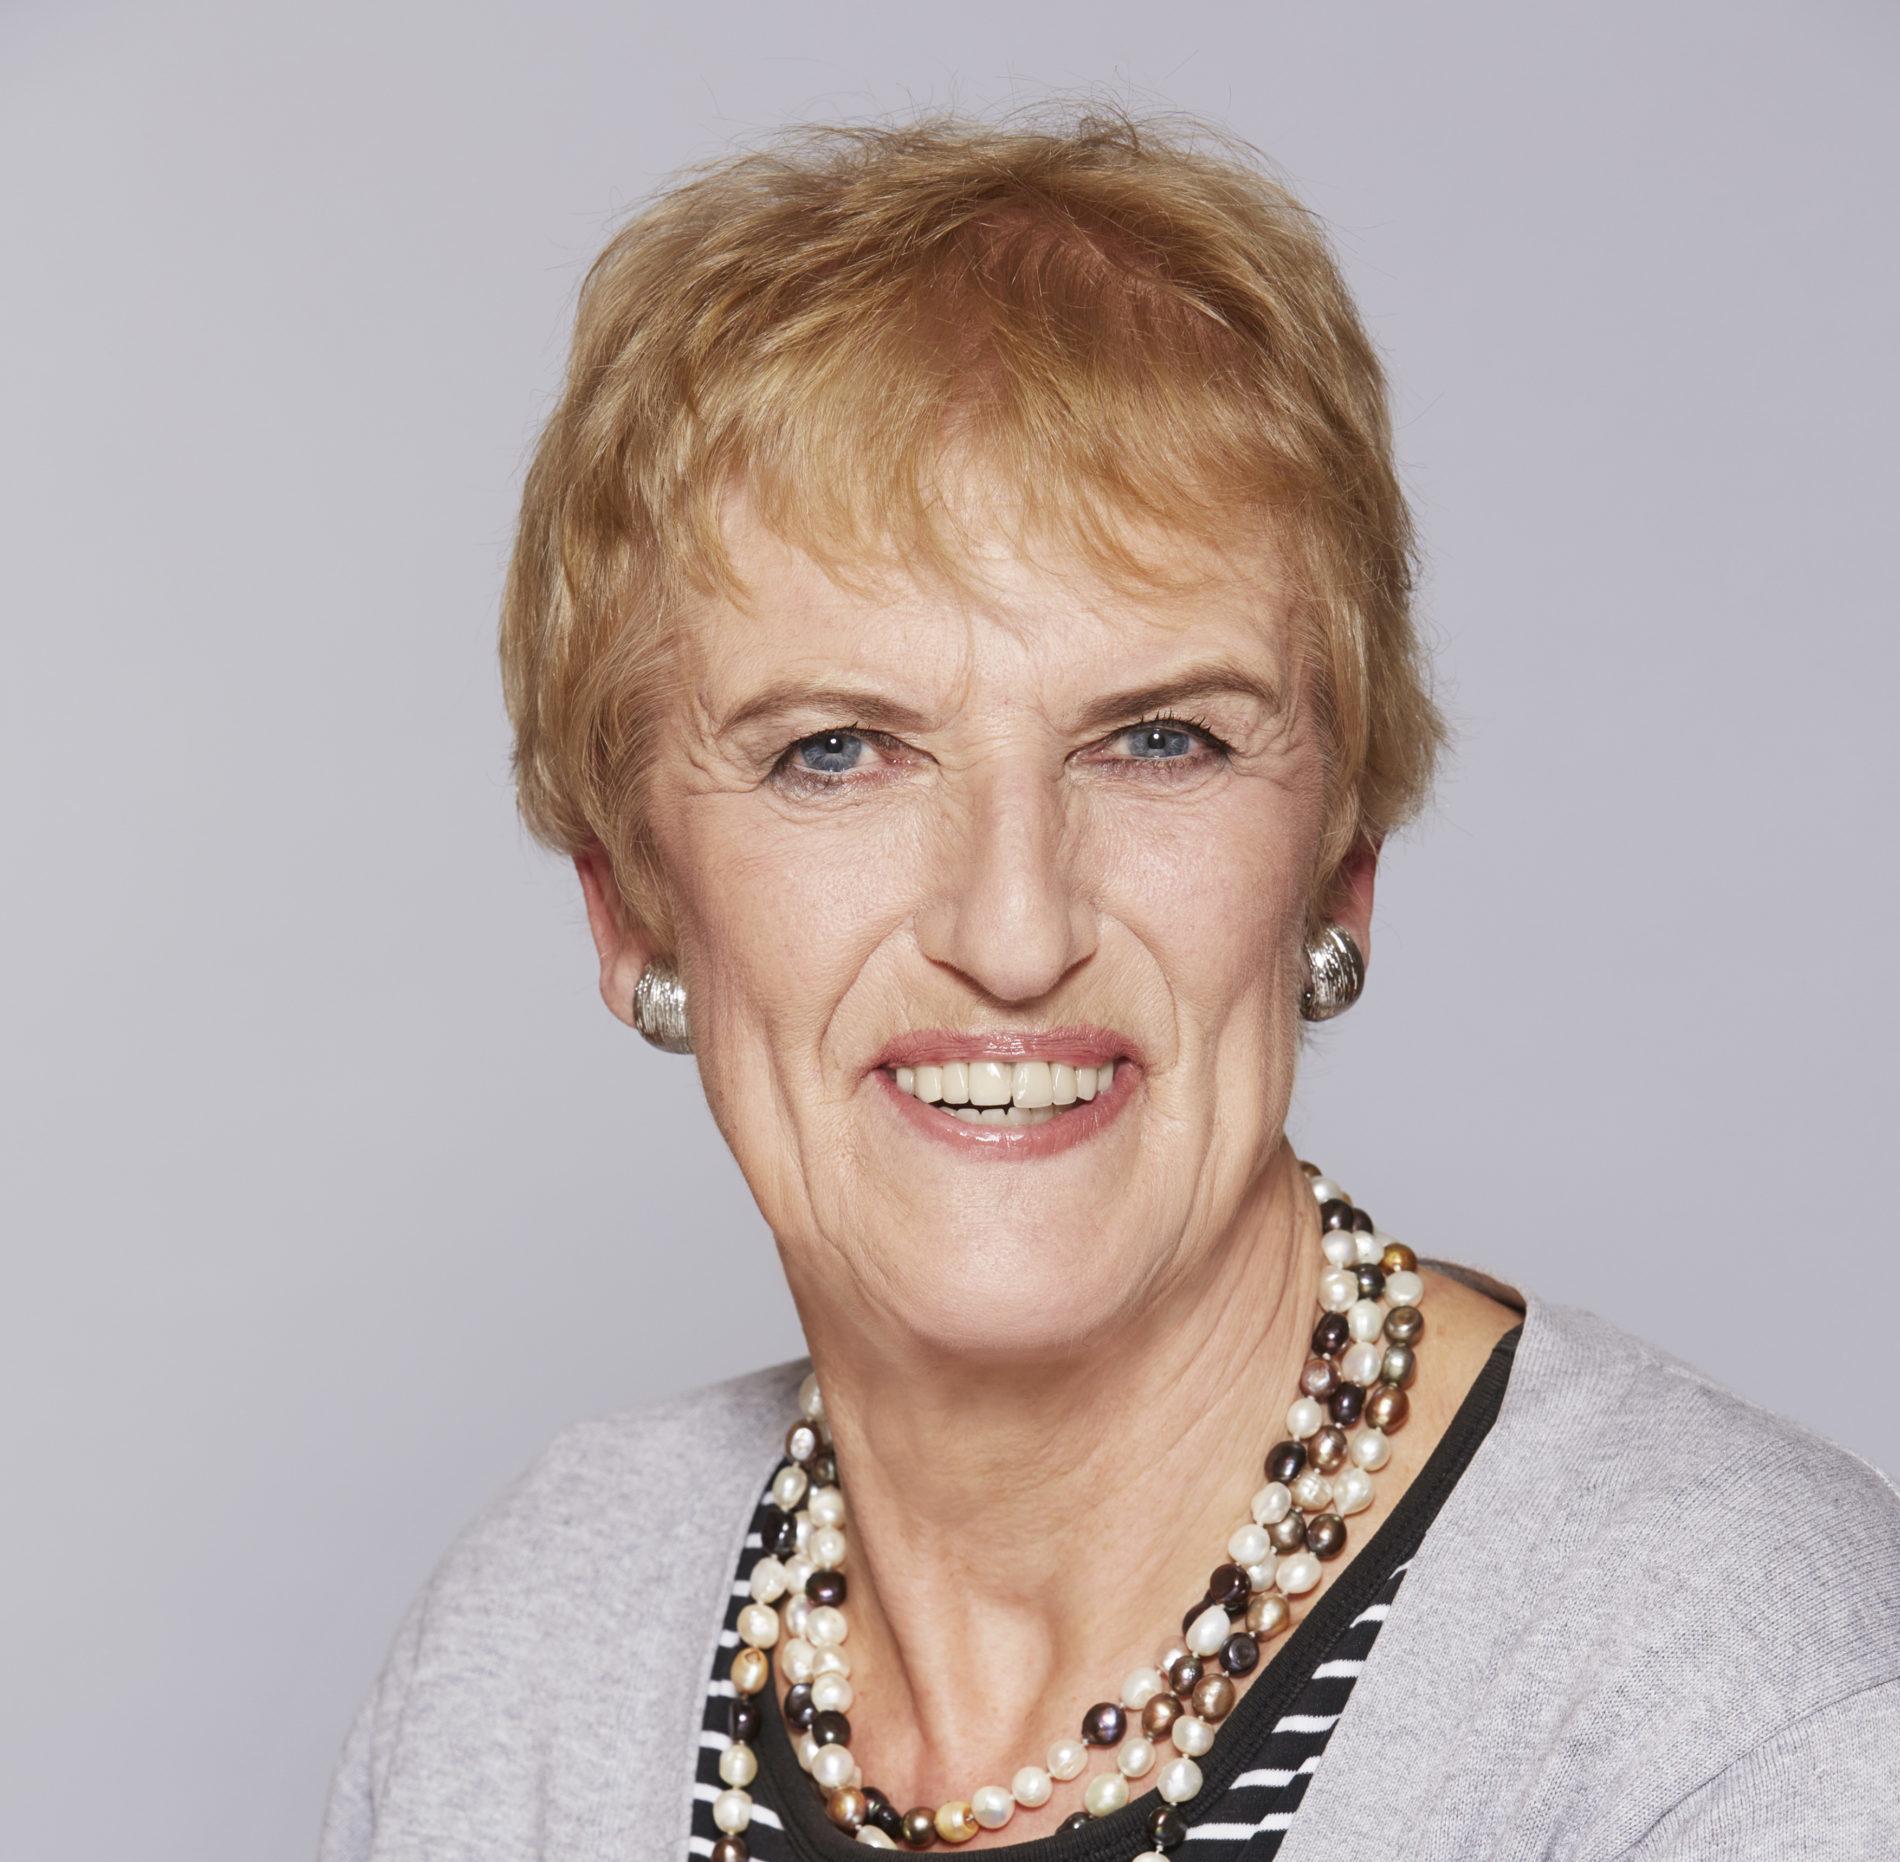 Dr. Christine Zippel